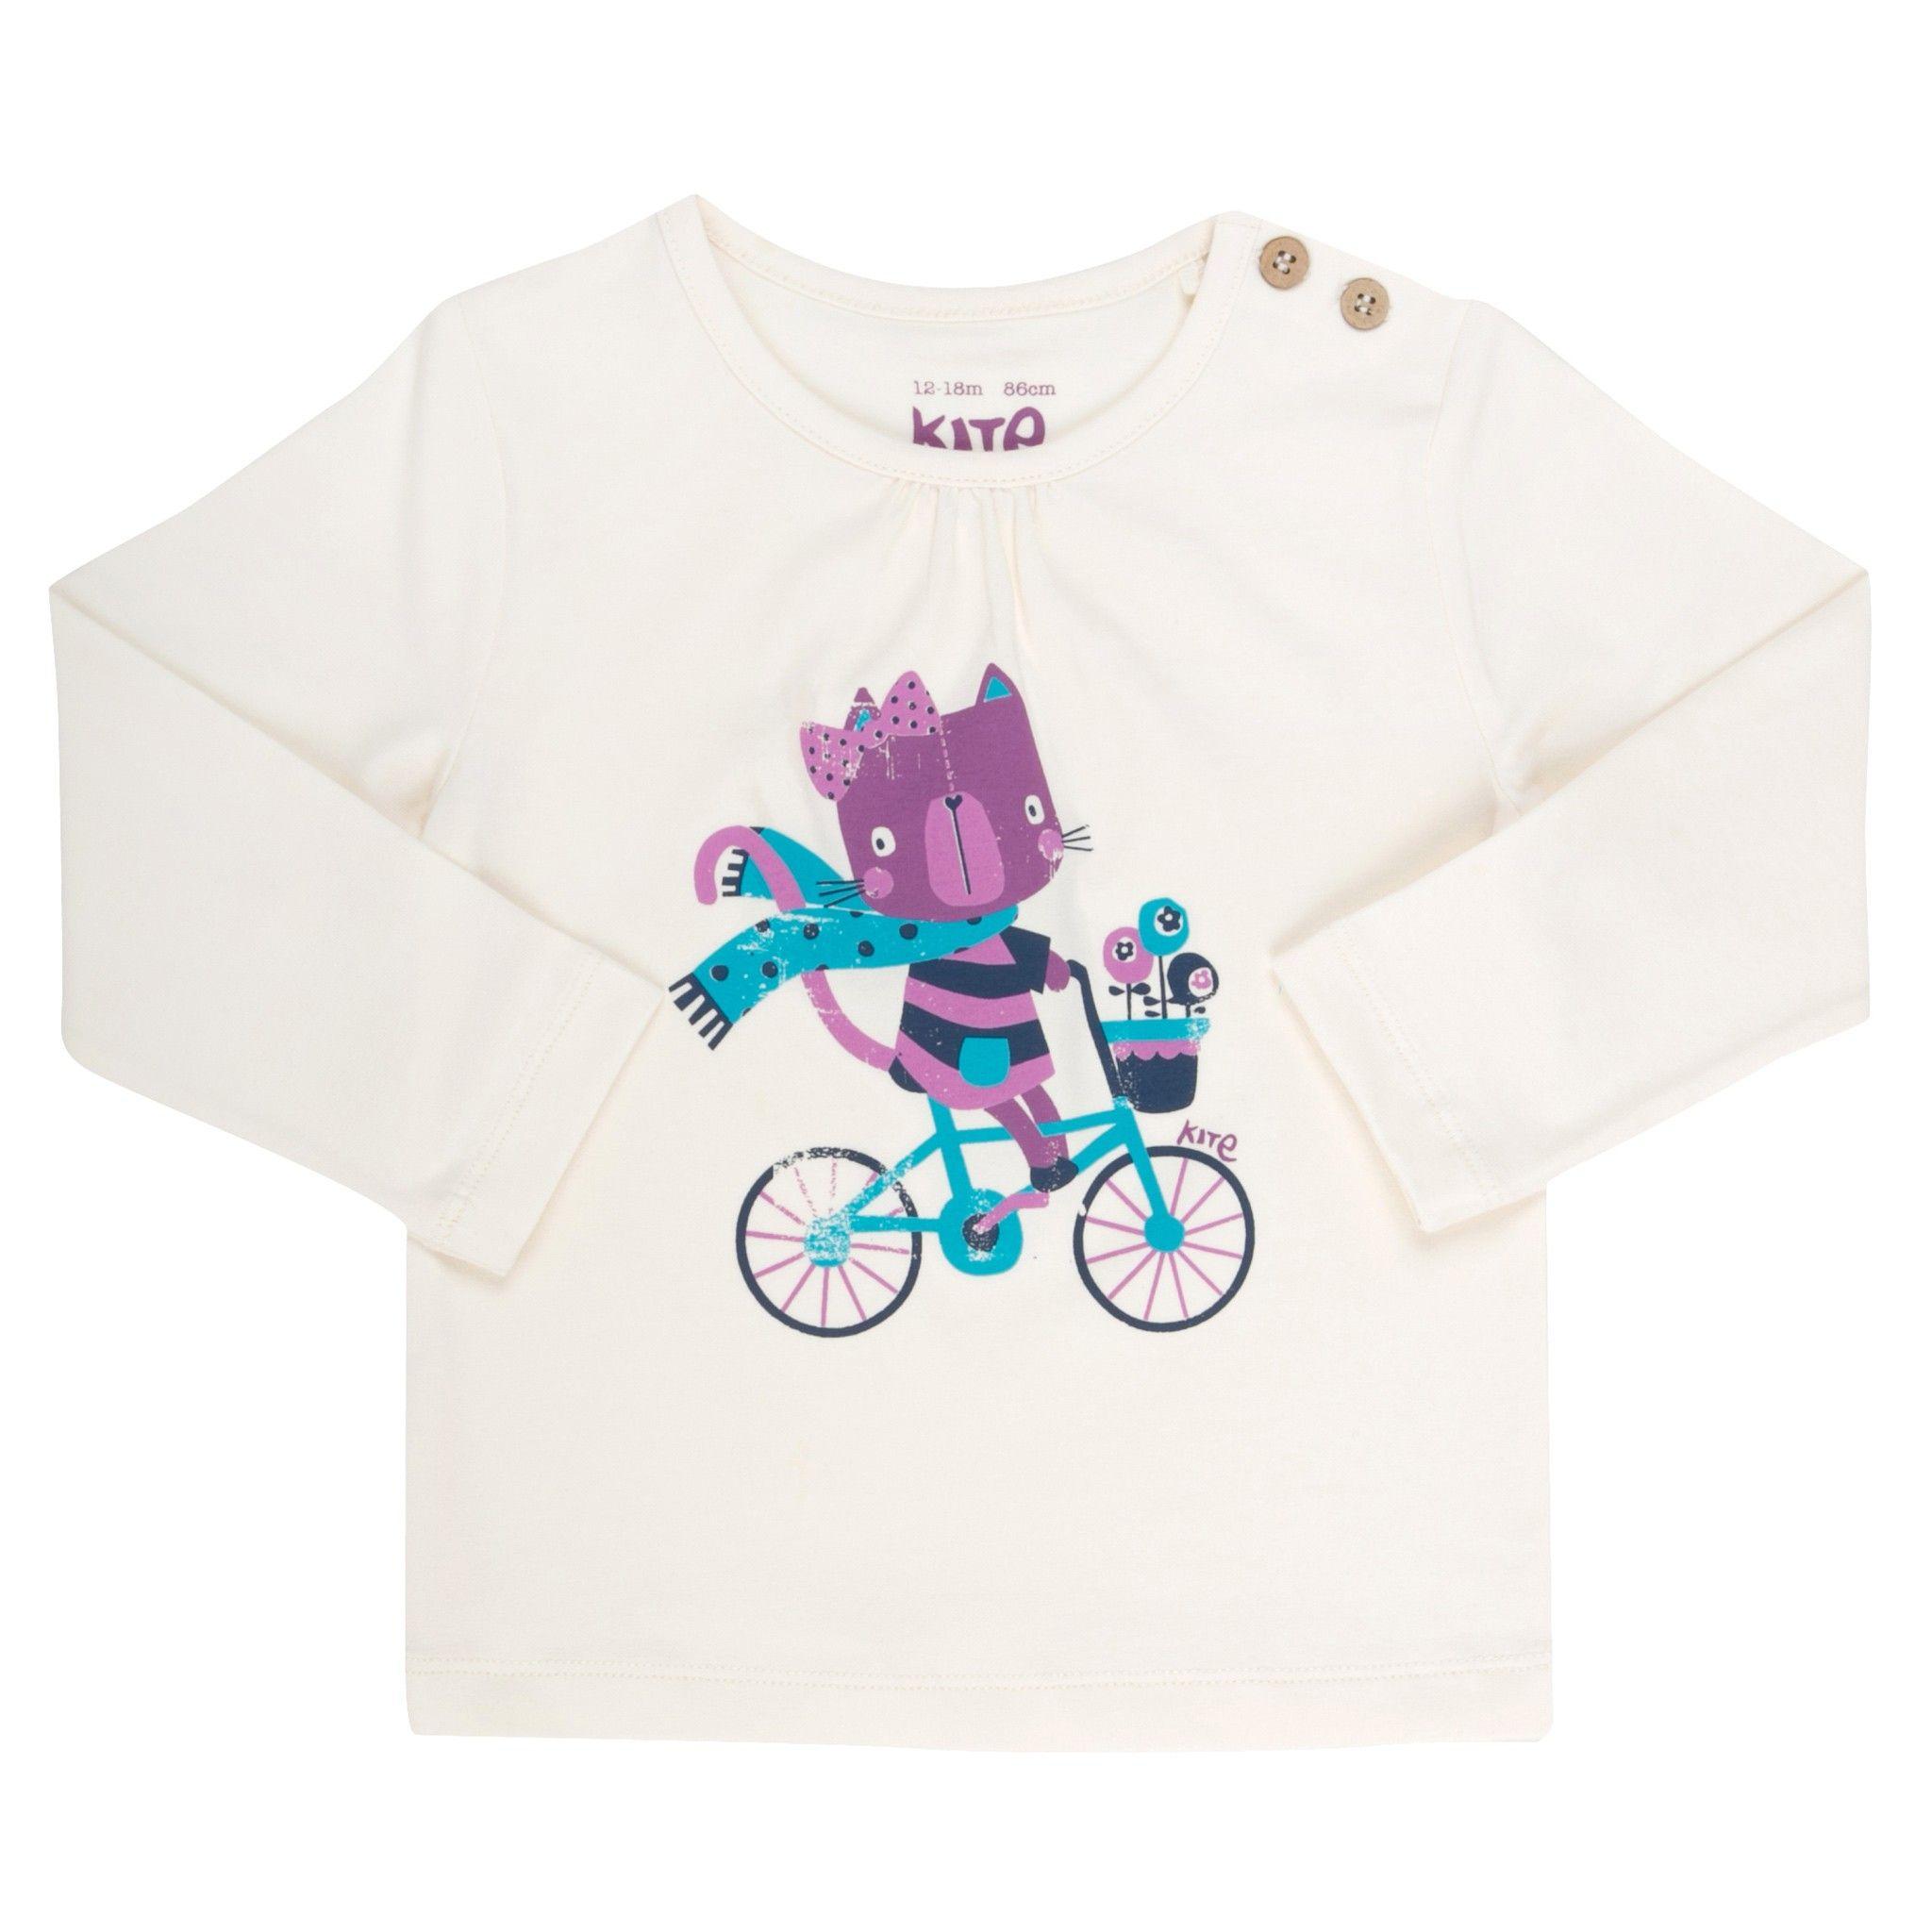 Pretty Kitty T shirt Baby Girl Tops Girls Little Chickie